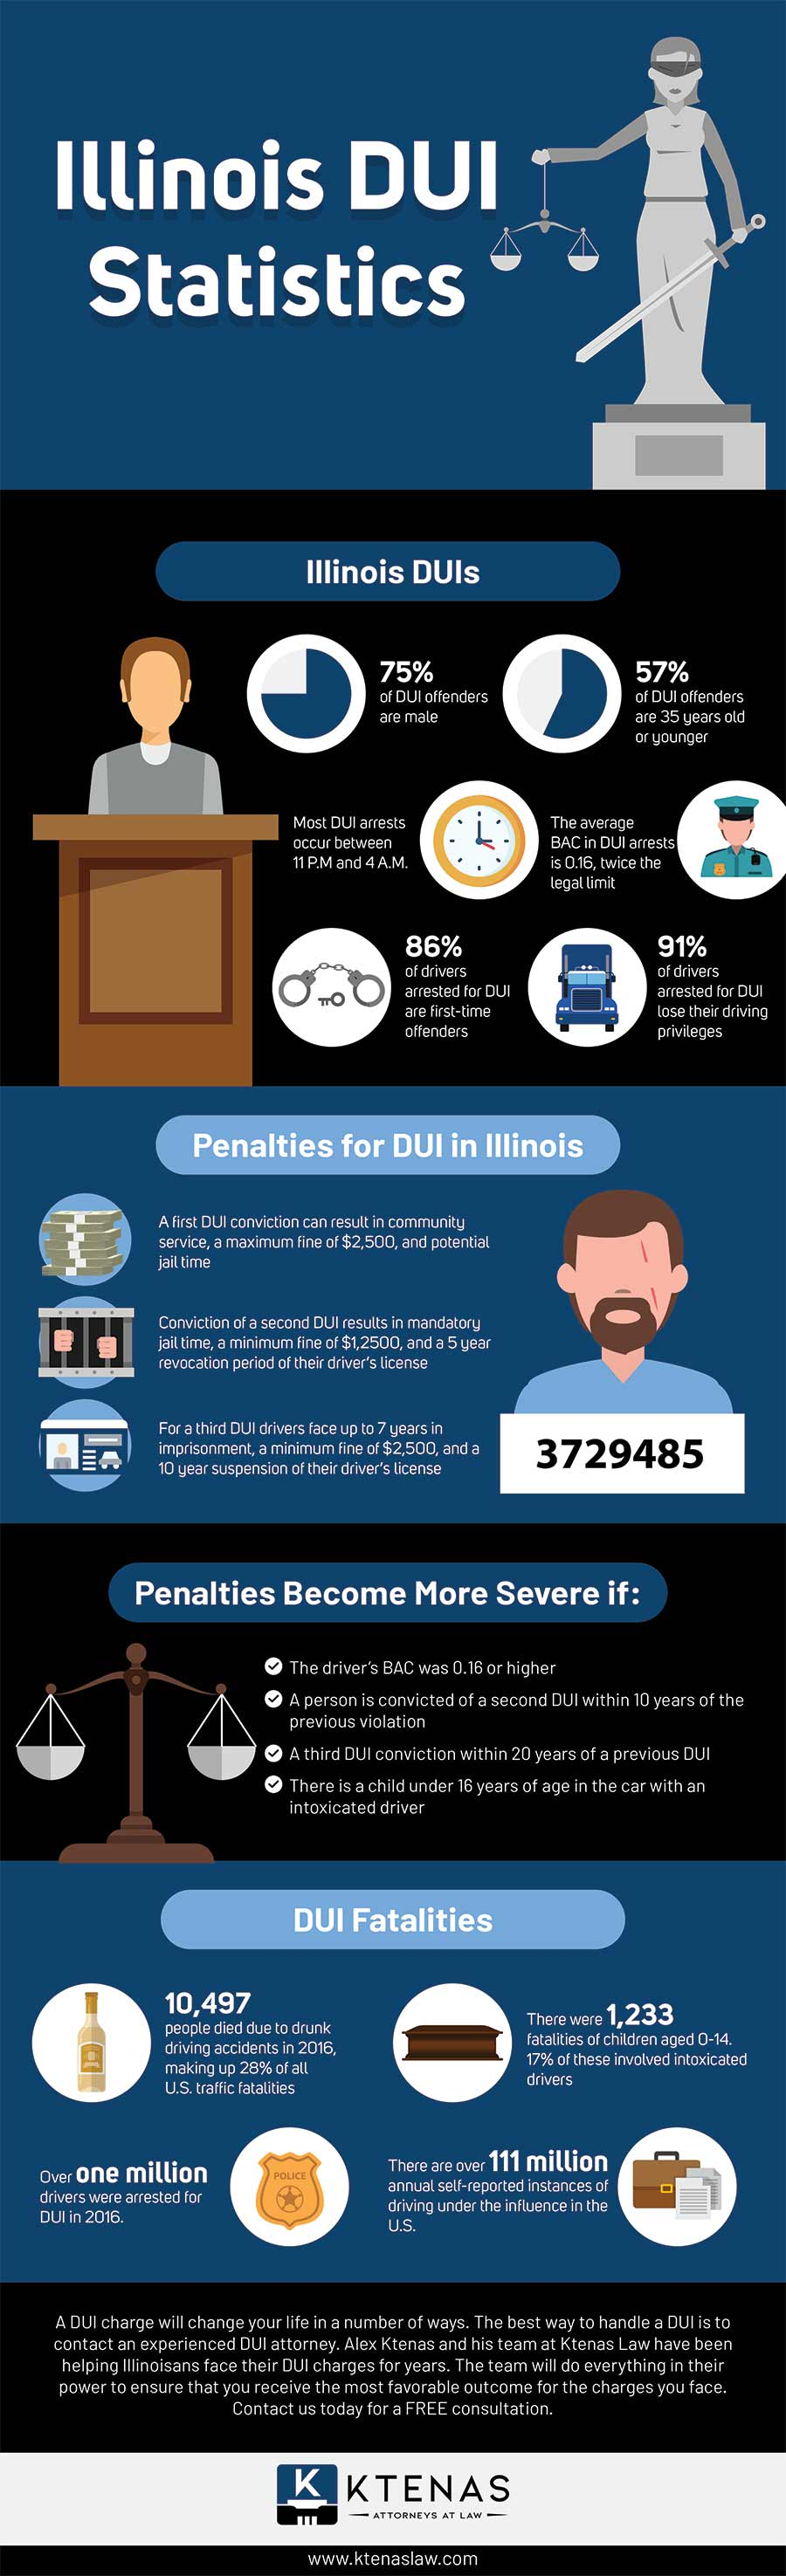 Illinois DUI statistics - Infographic